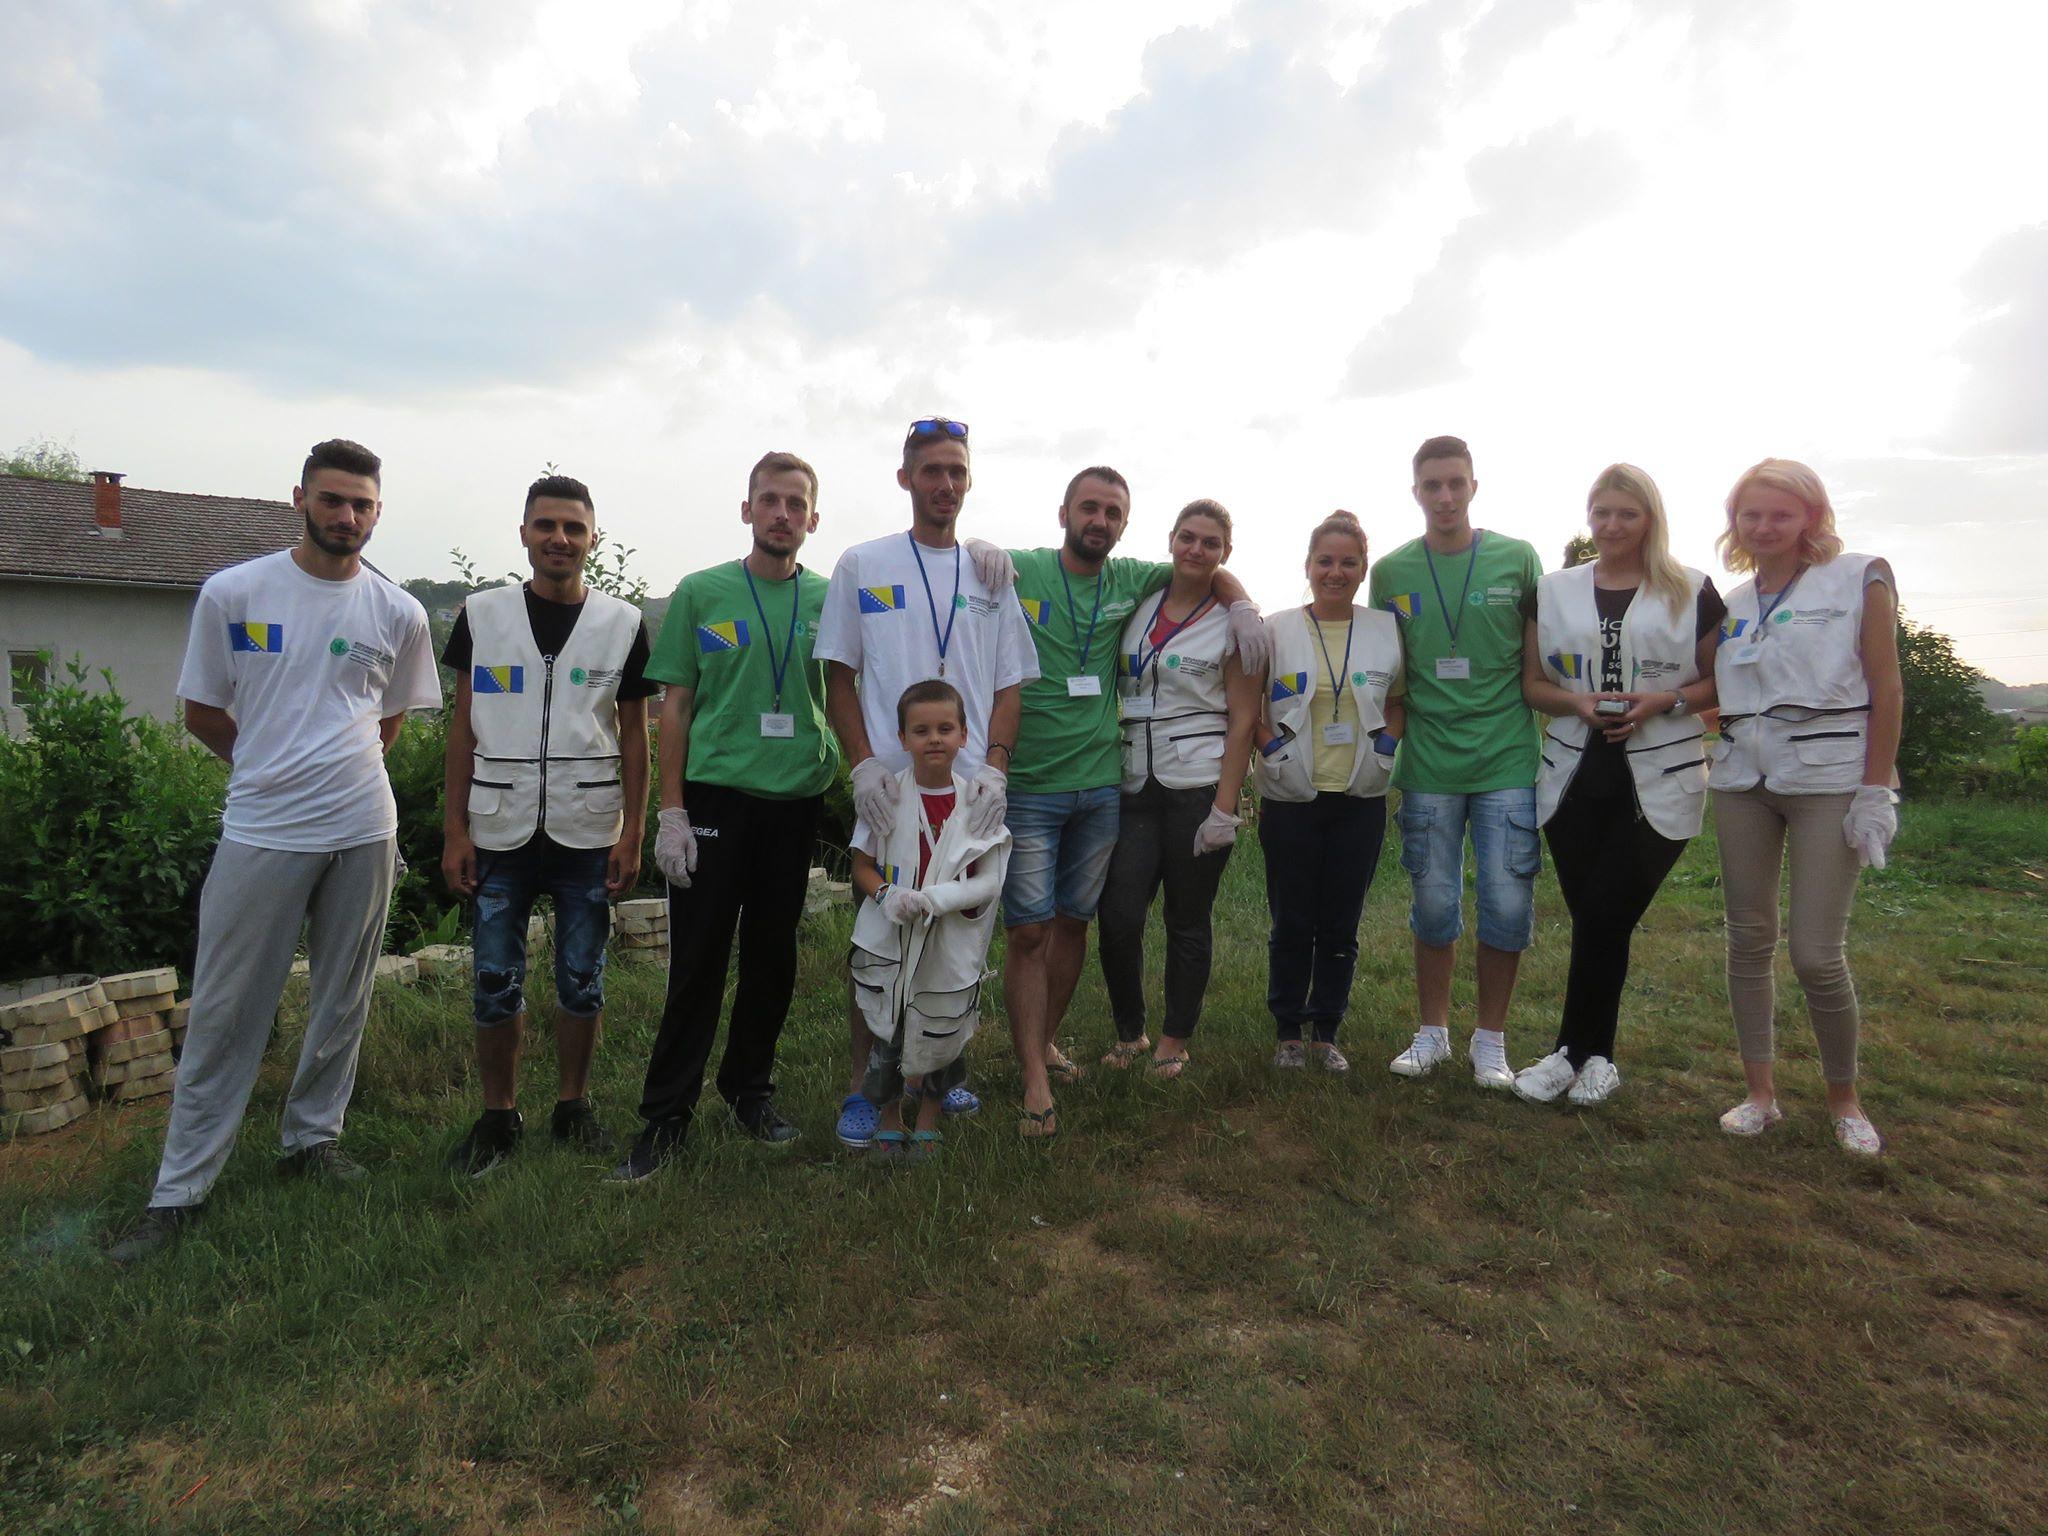 MFS-EMMAUS: Nastavljamo pomagati migrante u V. Kladuši i nakon Ramazana